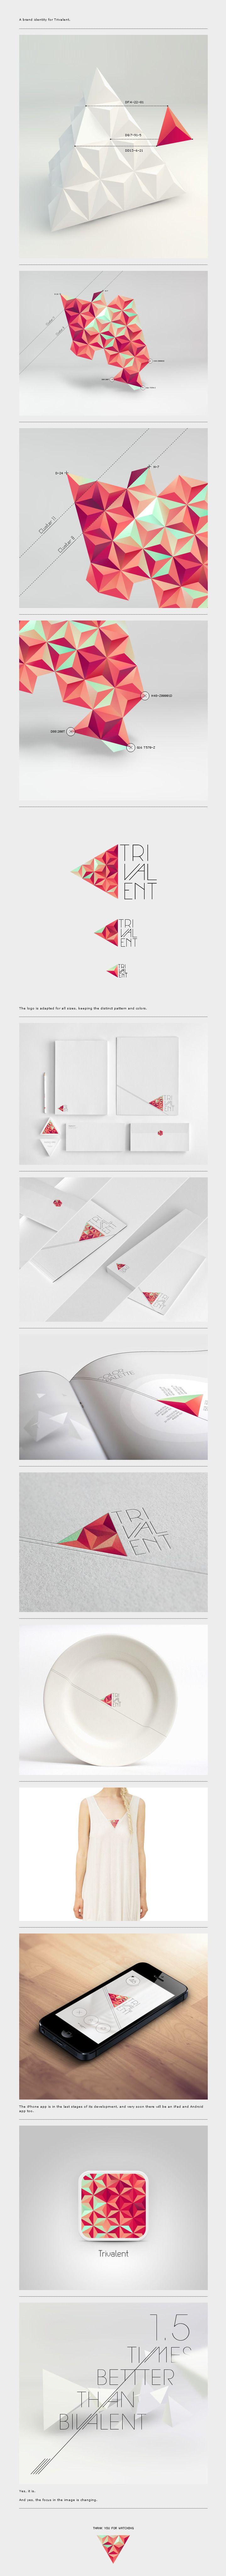 Trivalent Brand Identity | #stationary #corporate #design #corporatedesign #logo #identity #branding #marketing <<< repinned by an #advertising agency from #Hamburg / #Germany - www.BlickeDeeler.de | Follow us on www.facebook.com/BlickeDeeler